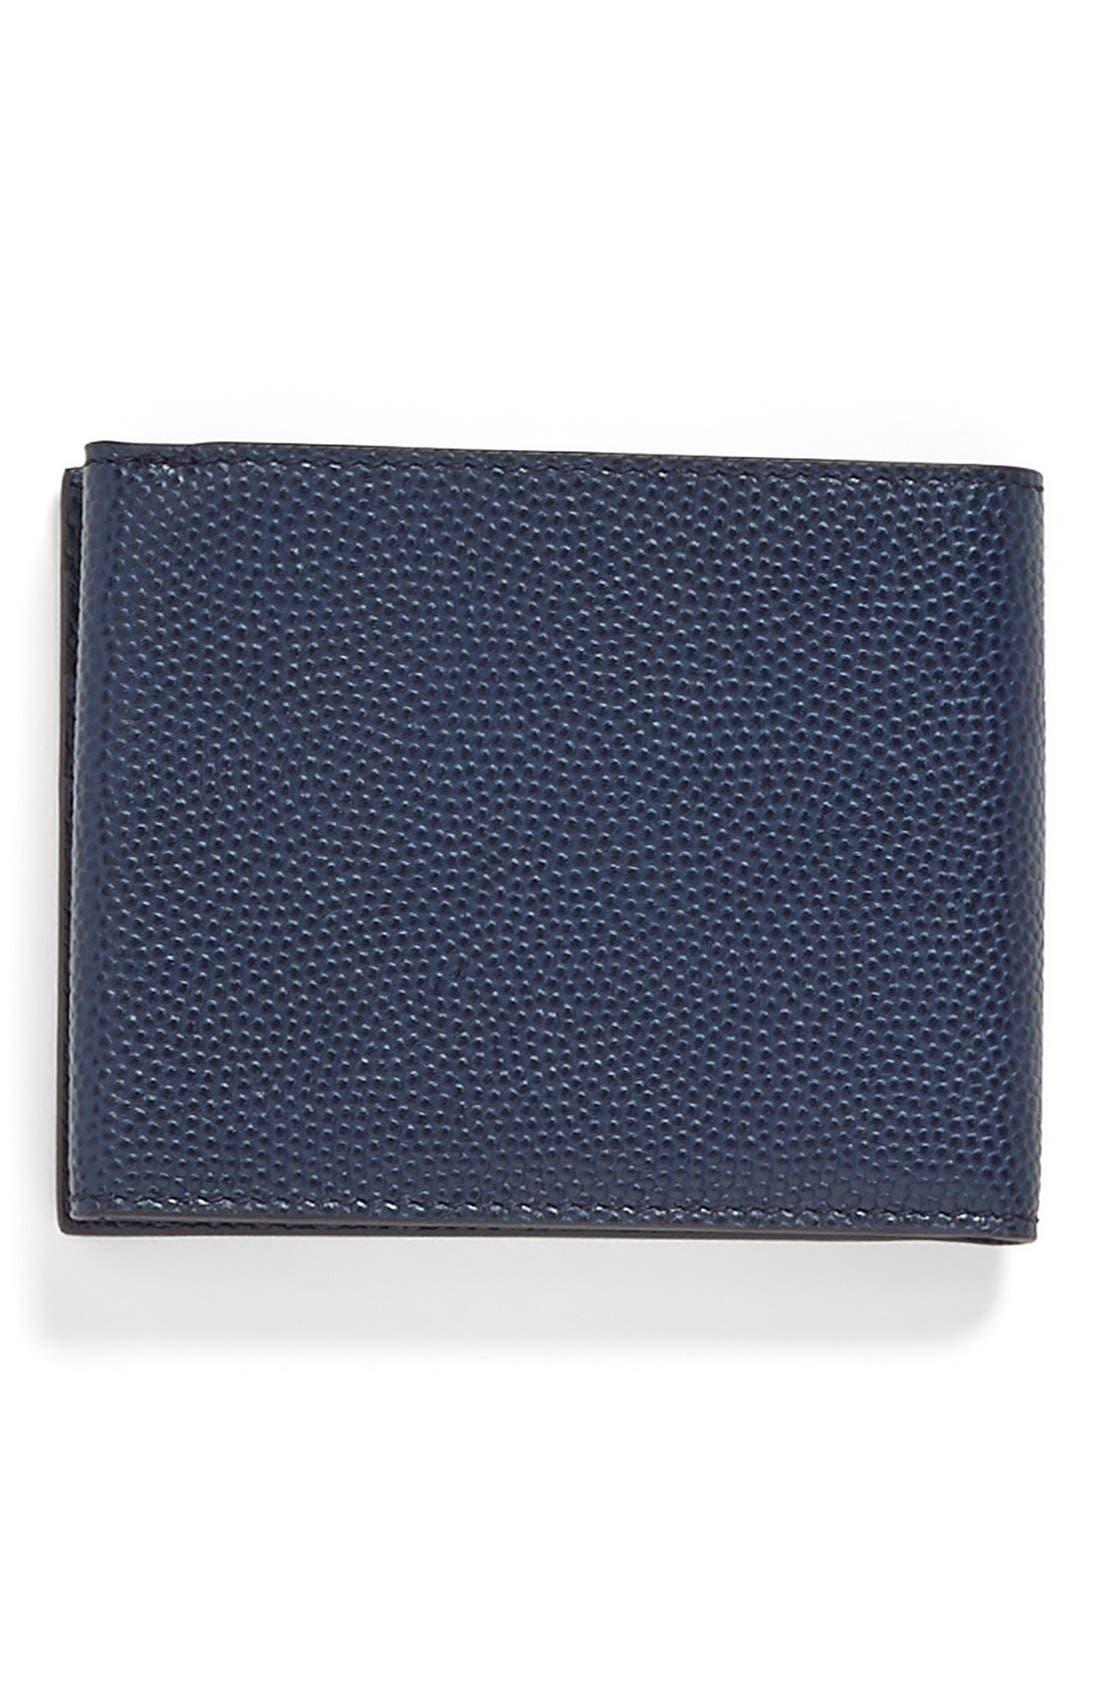 Alternate Image 3  - Salvatore Ferragamo Trifold Wallet